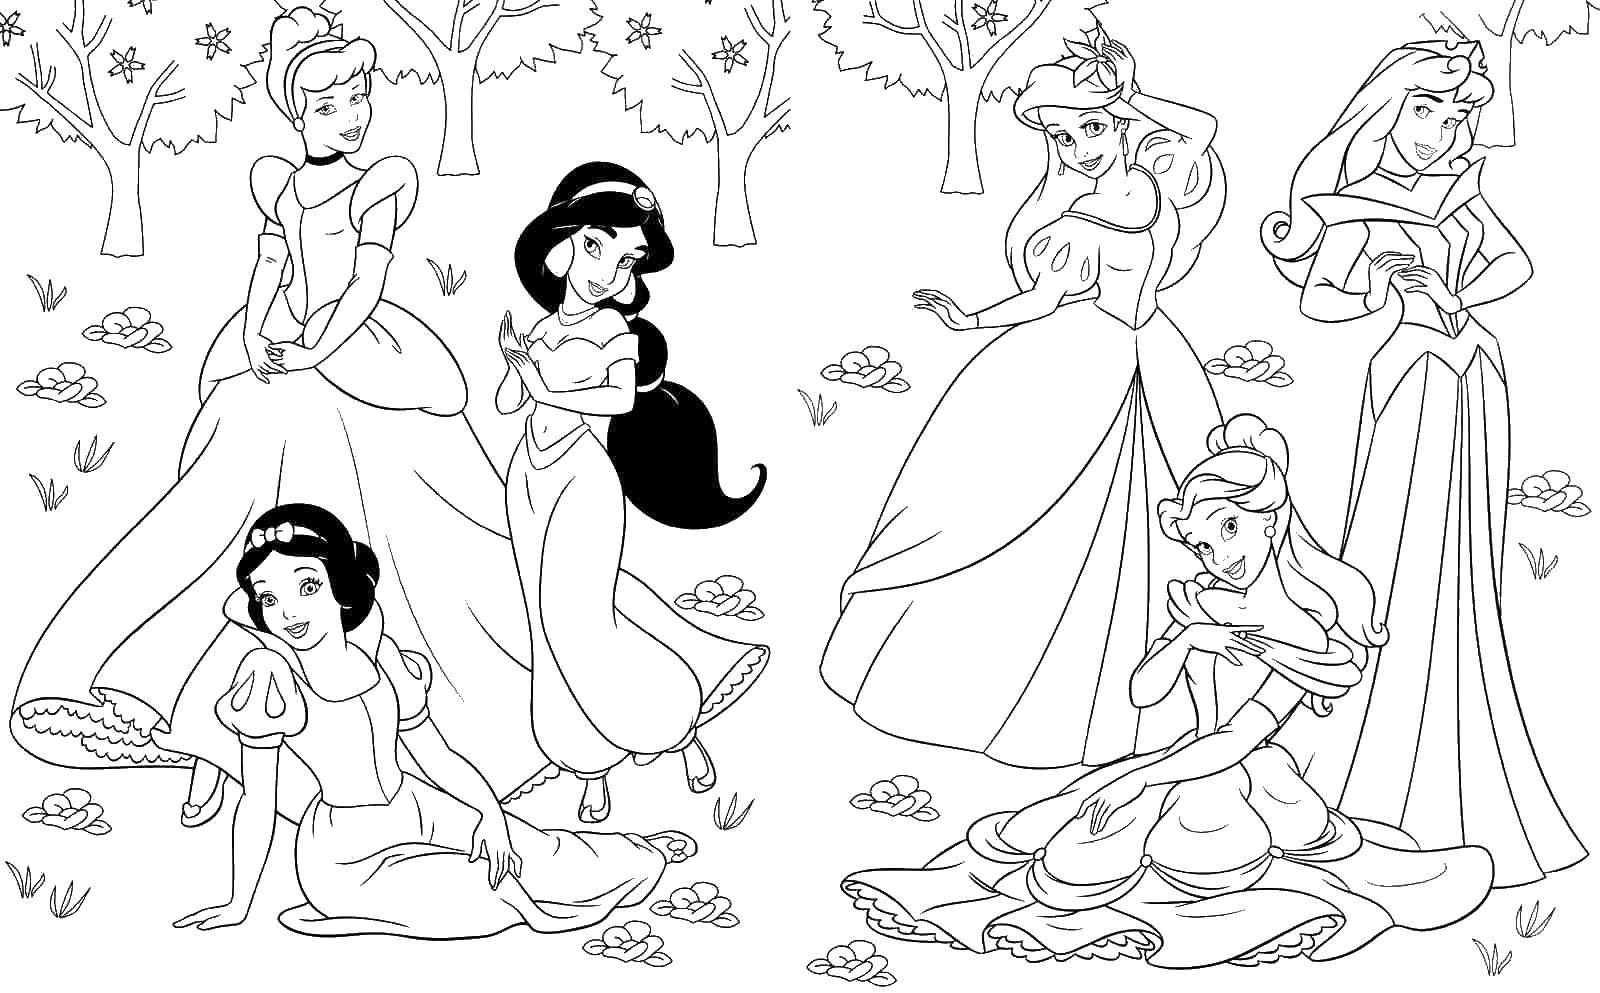 Раскраска Принцессы диснея Скачать принцессы, диснея.  Распечатать ,принцесса,